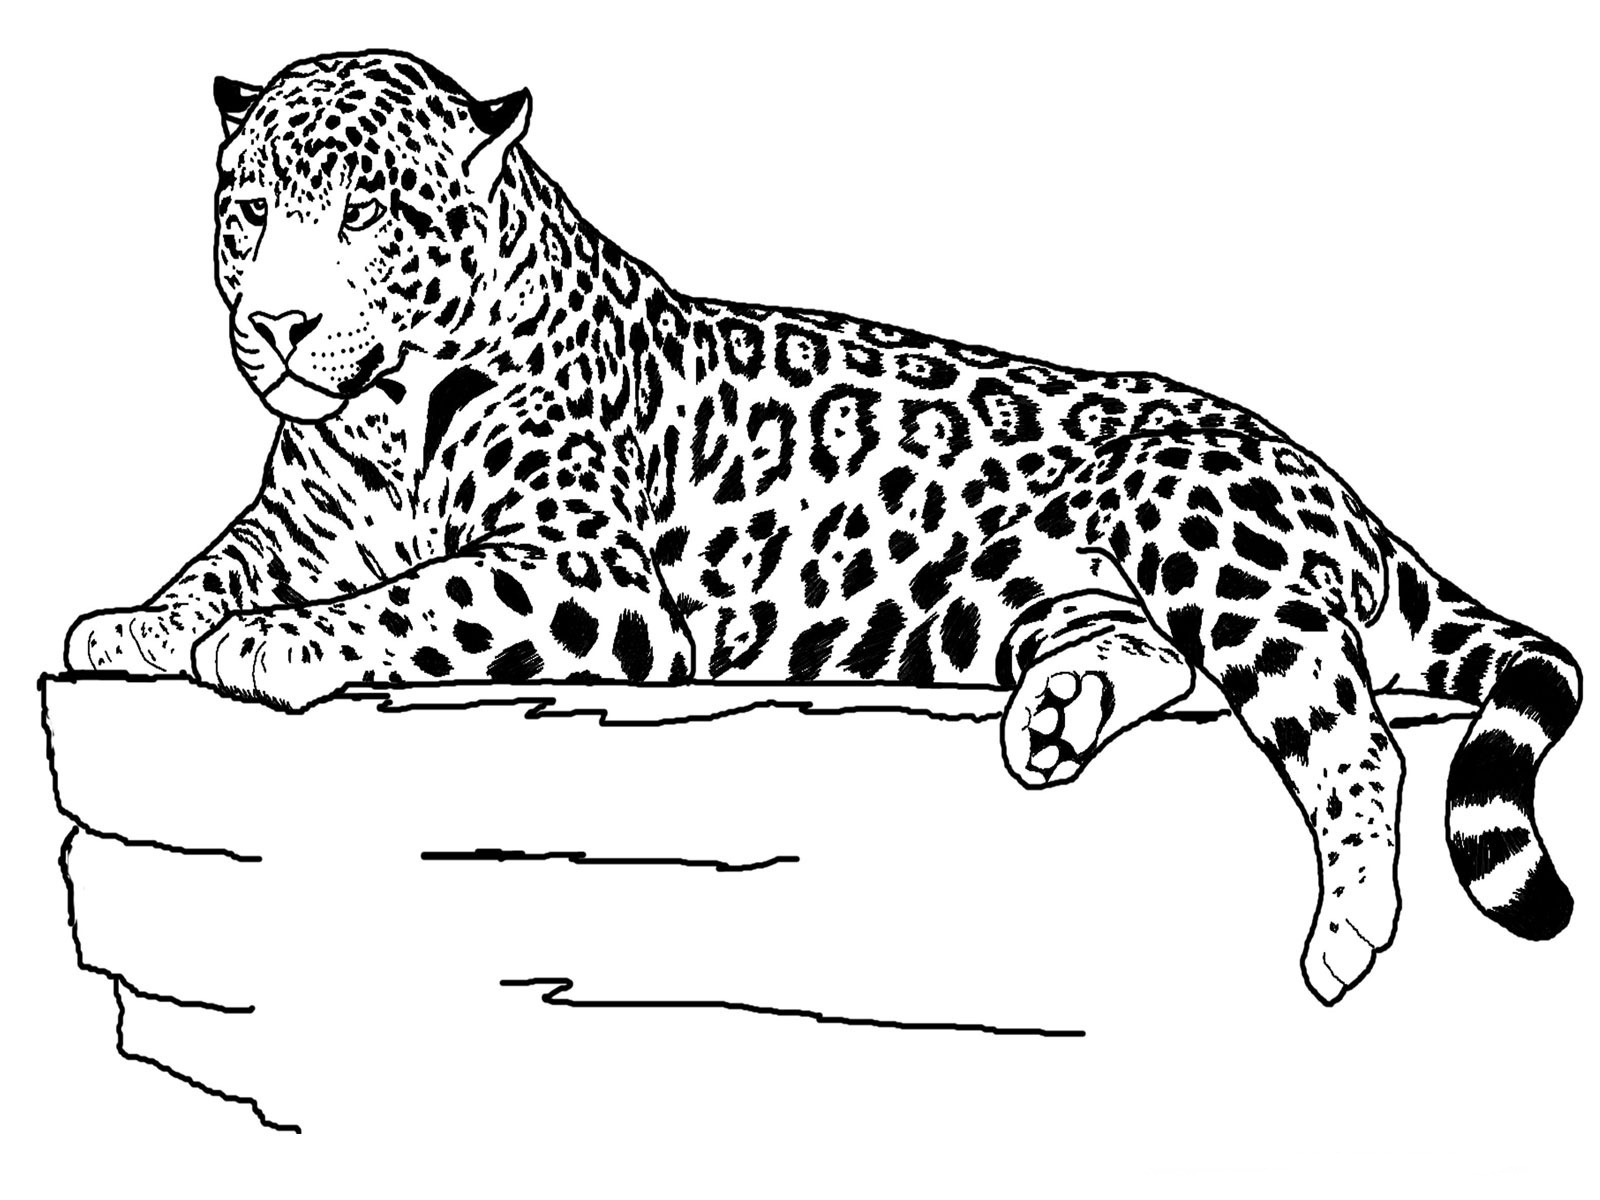 1600x1200 Elegant Free Printable Cheetah Coloring Pages For Kids Free